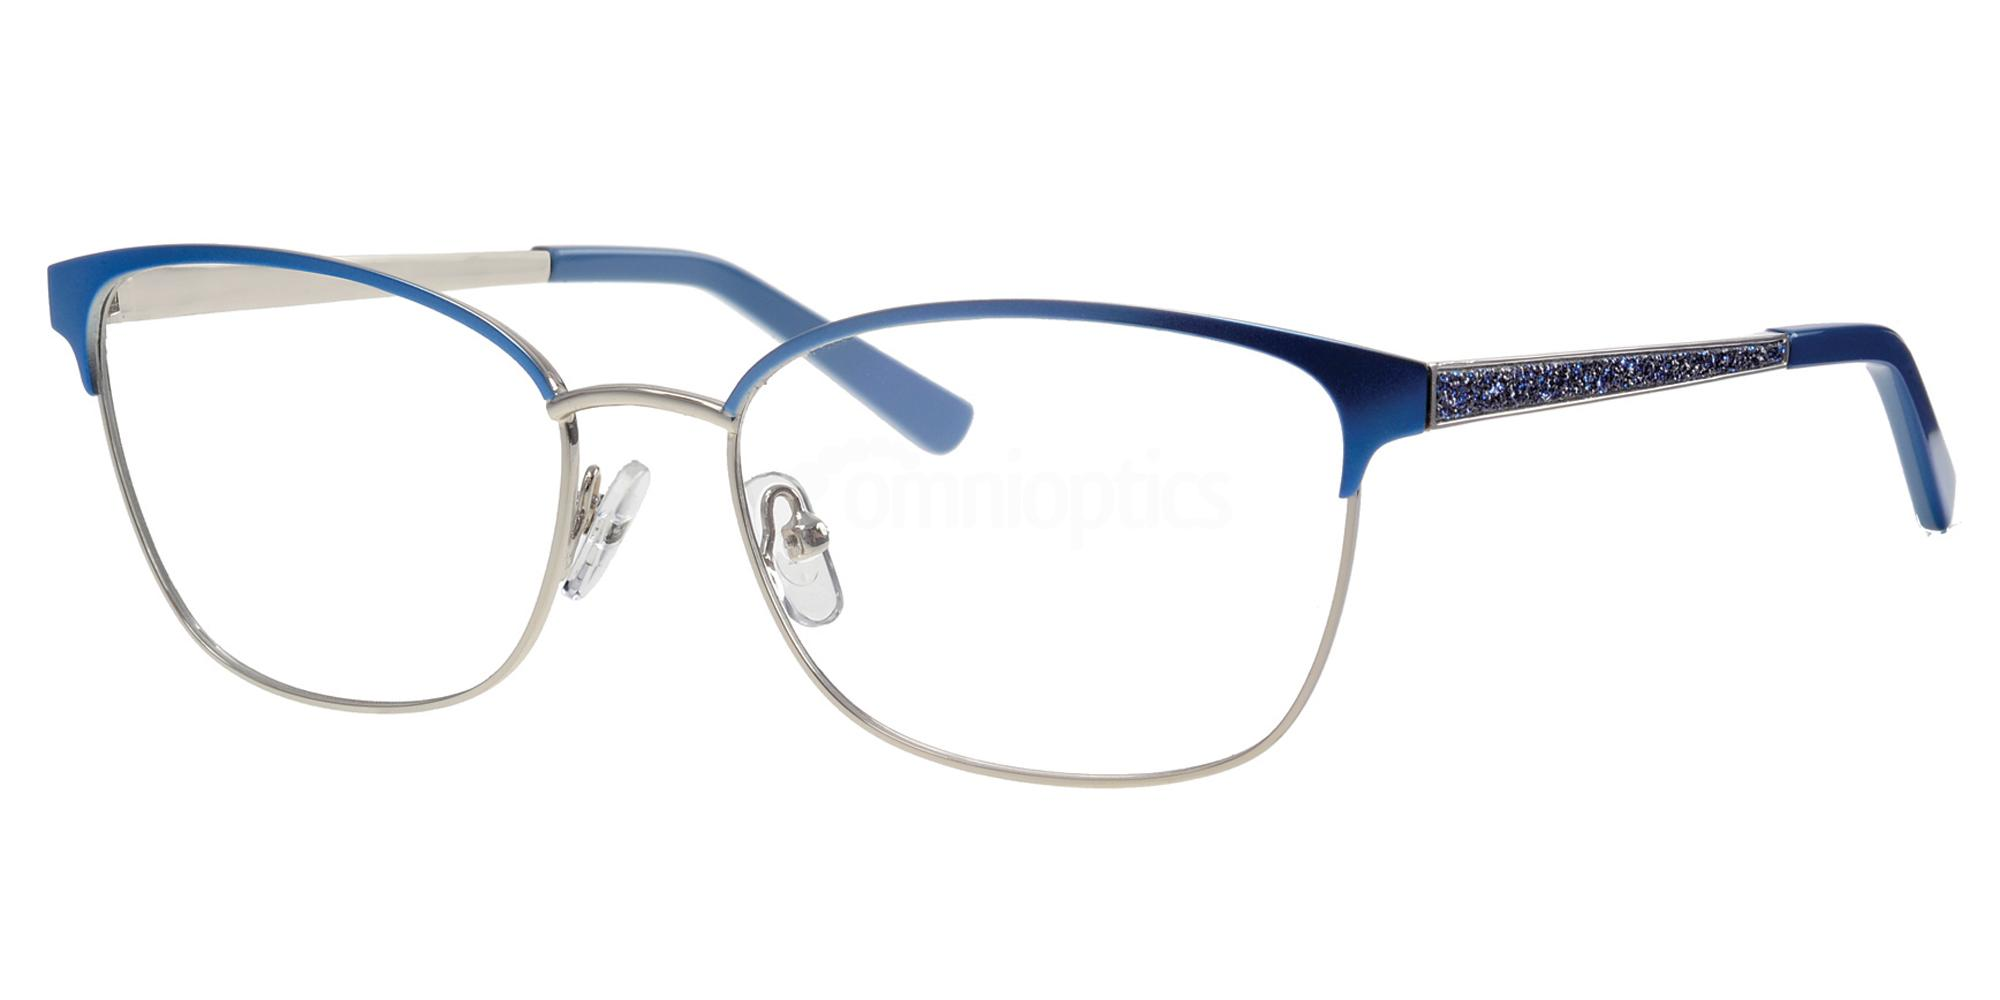 C01 2568 Glasses, Joia